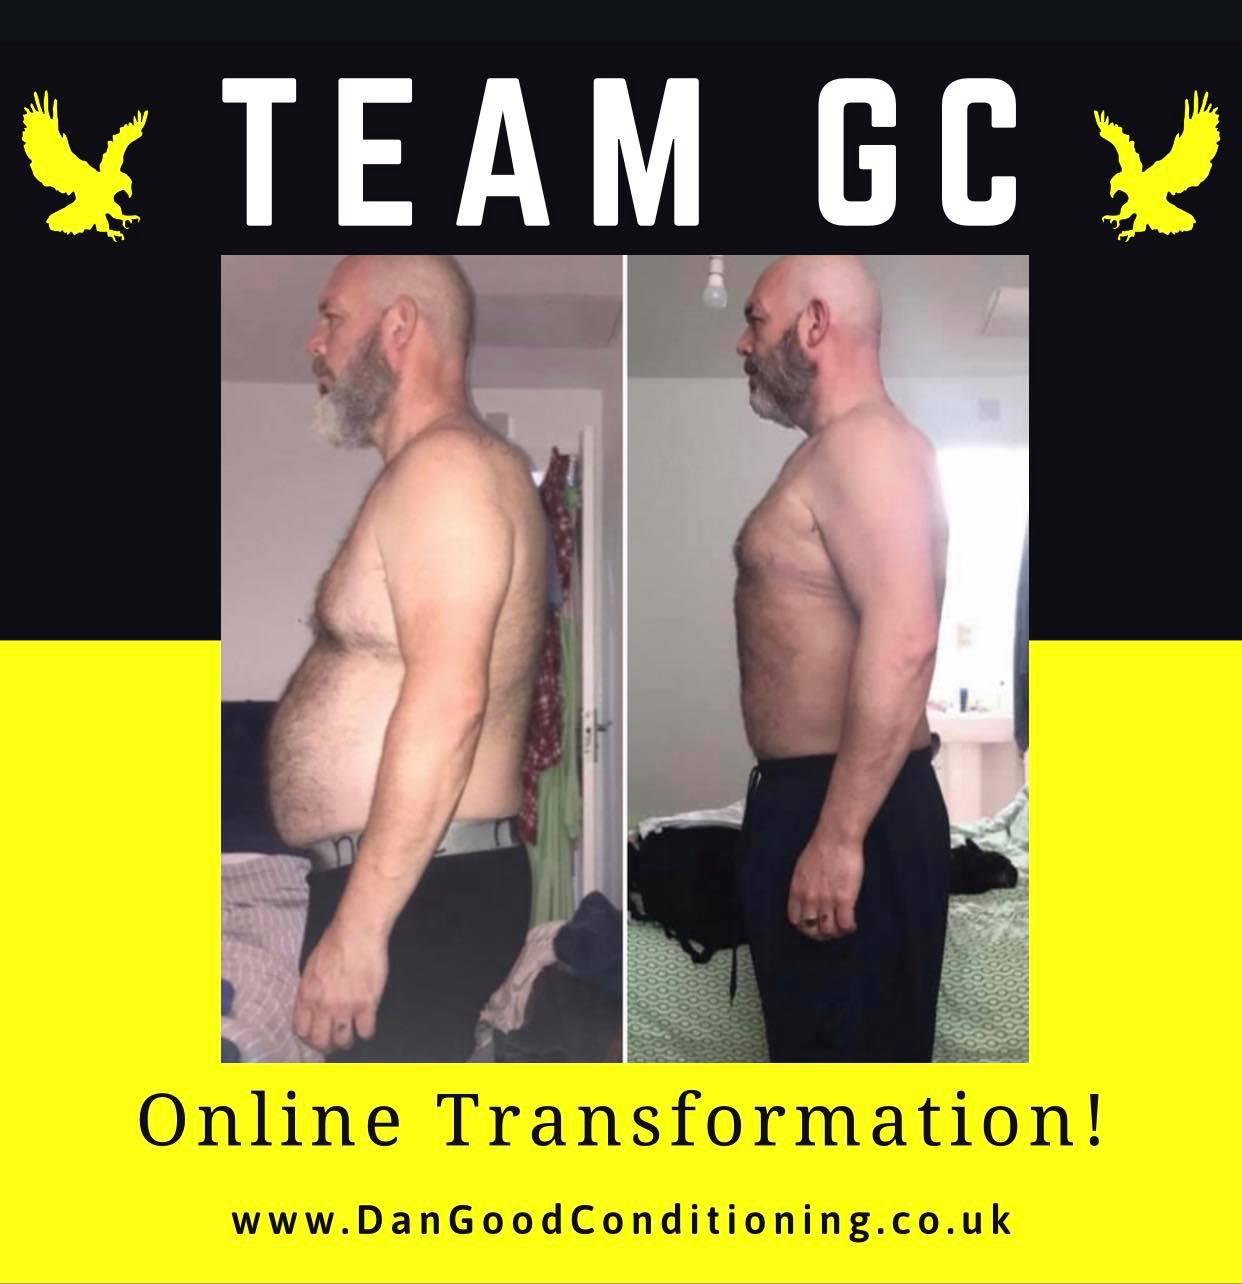 John Mackenzie - Team GC Member